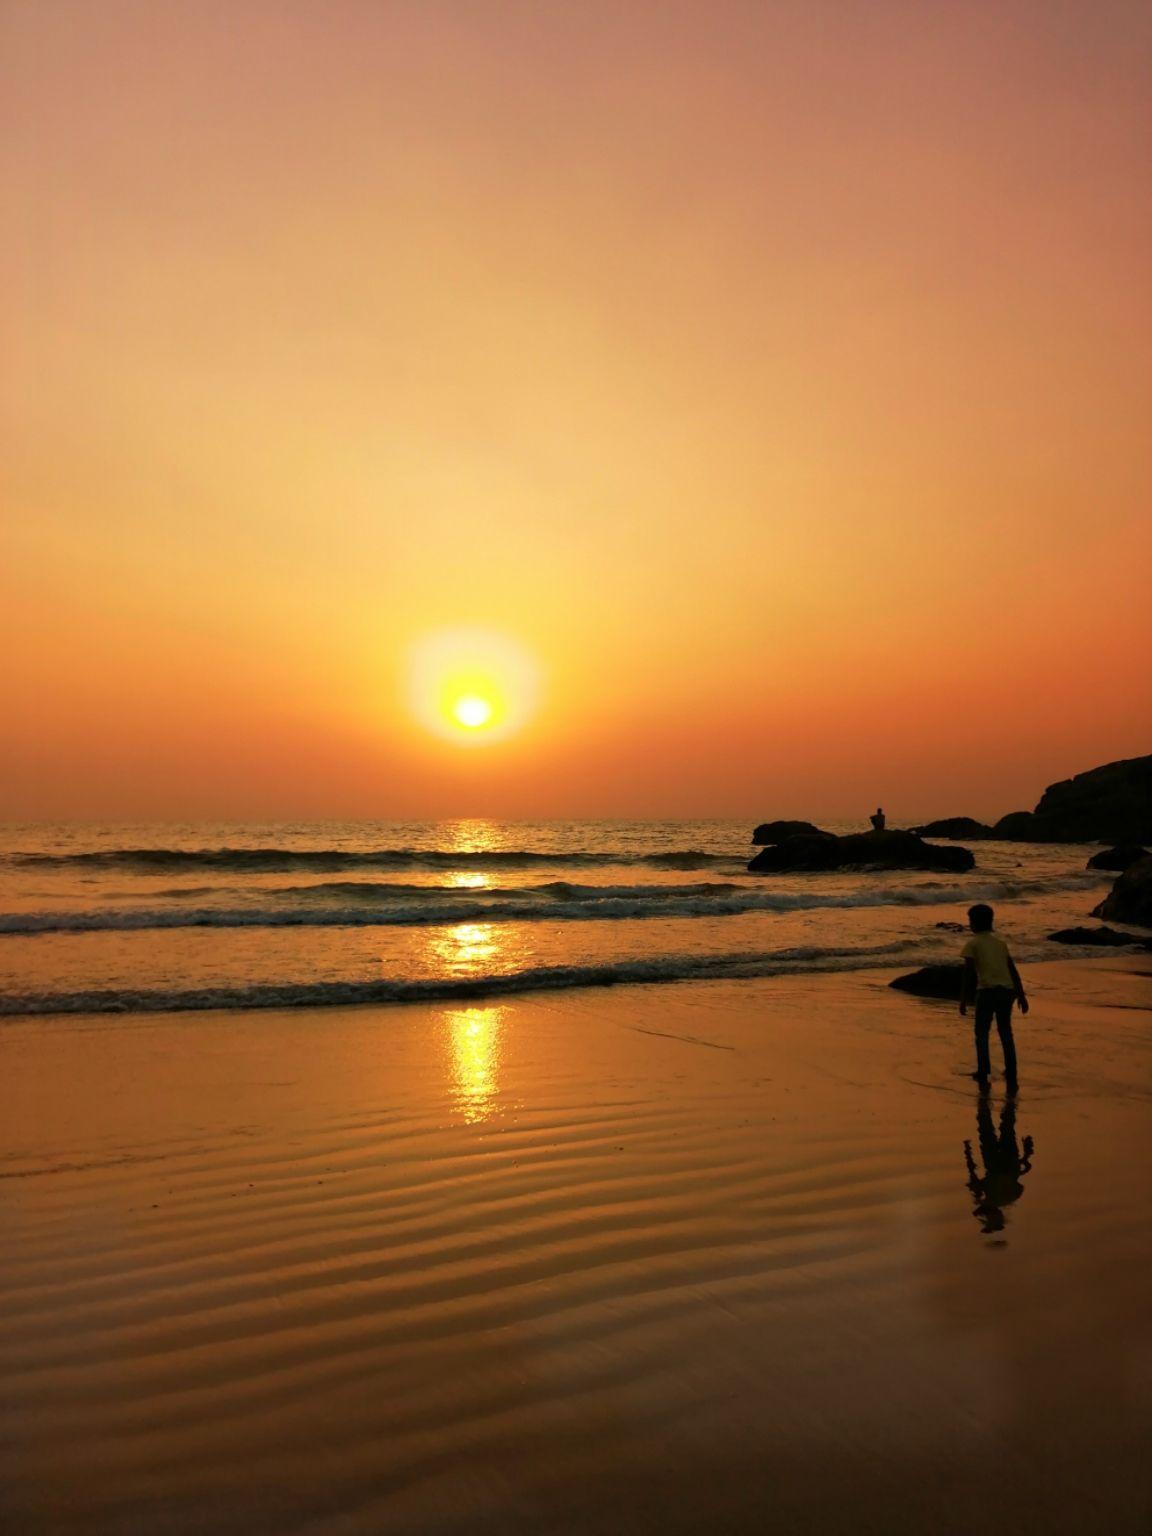 Photo of Kudle Beach By Ganesh Bhat